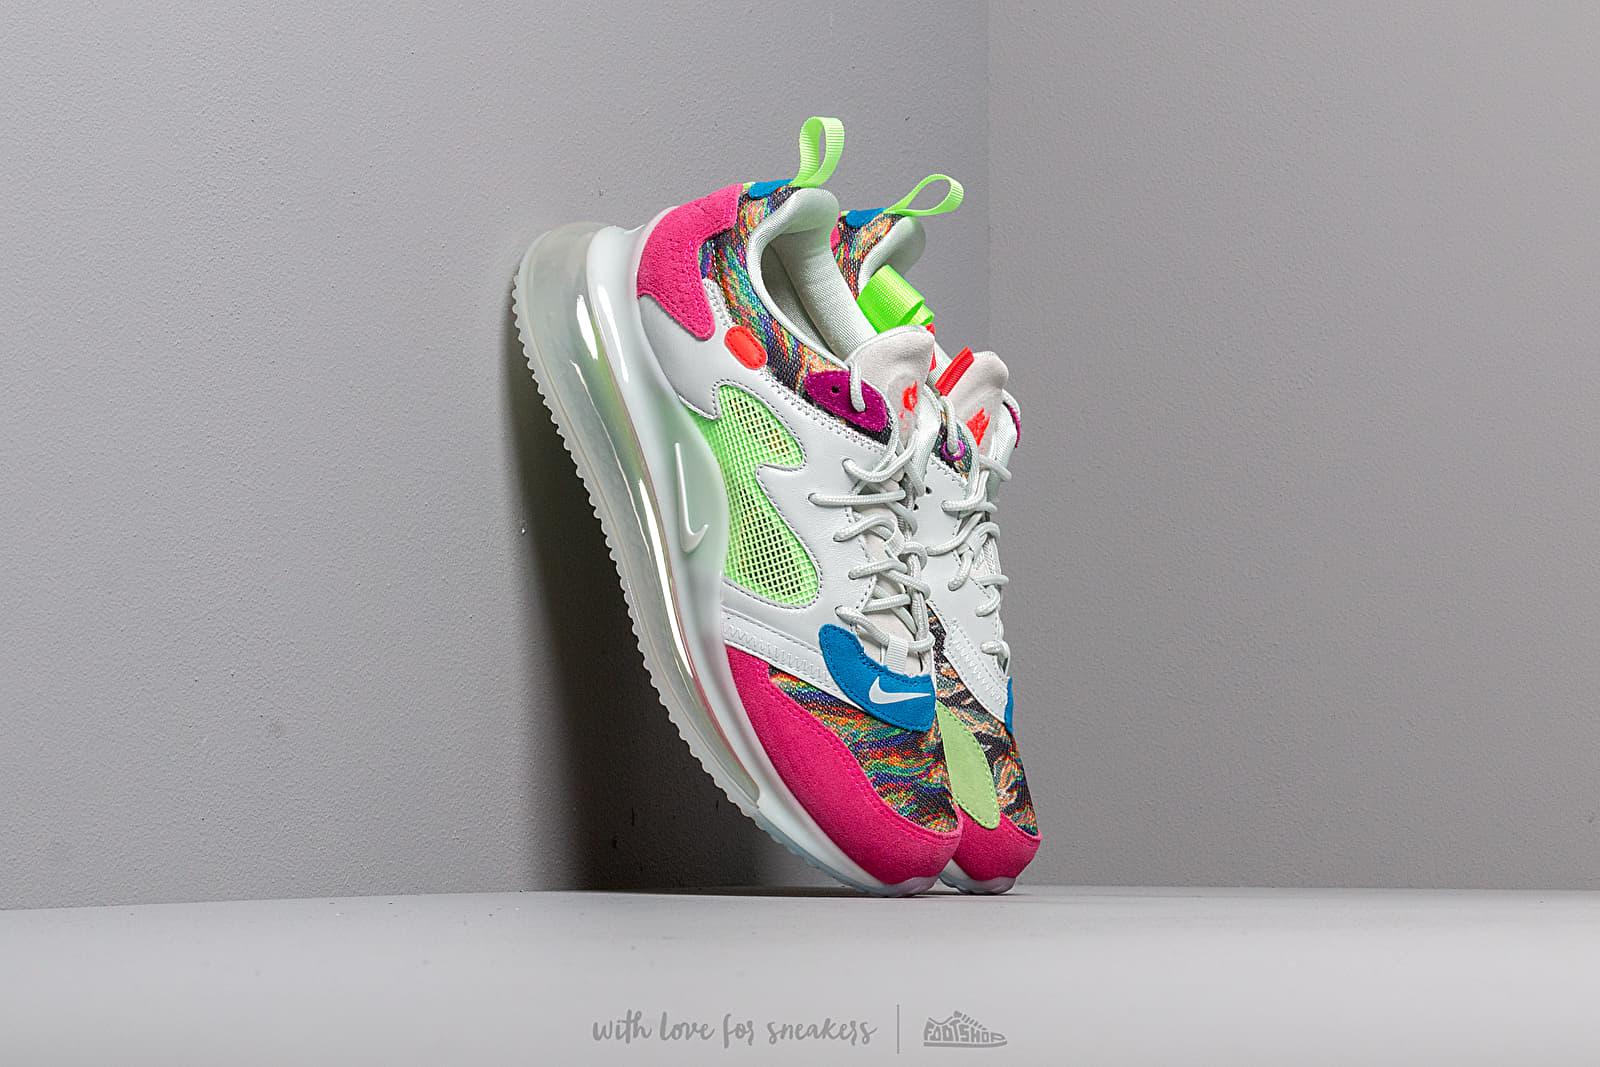 Nike Air Max 720 OBJ Multi Color Hyper Pink Lime Blast | Footshop